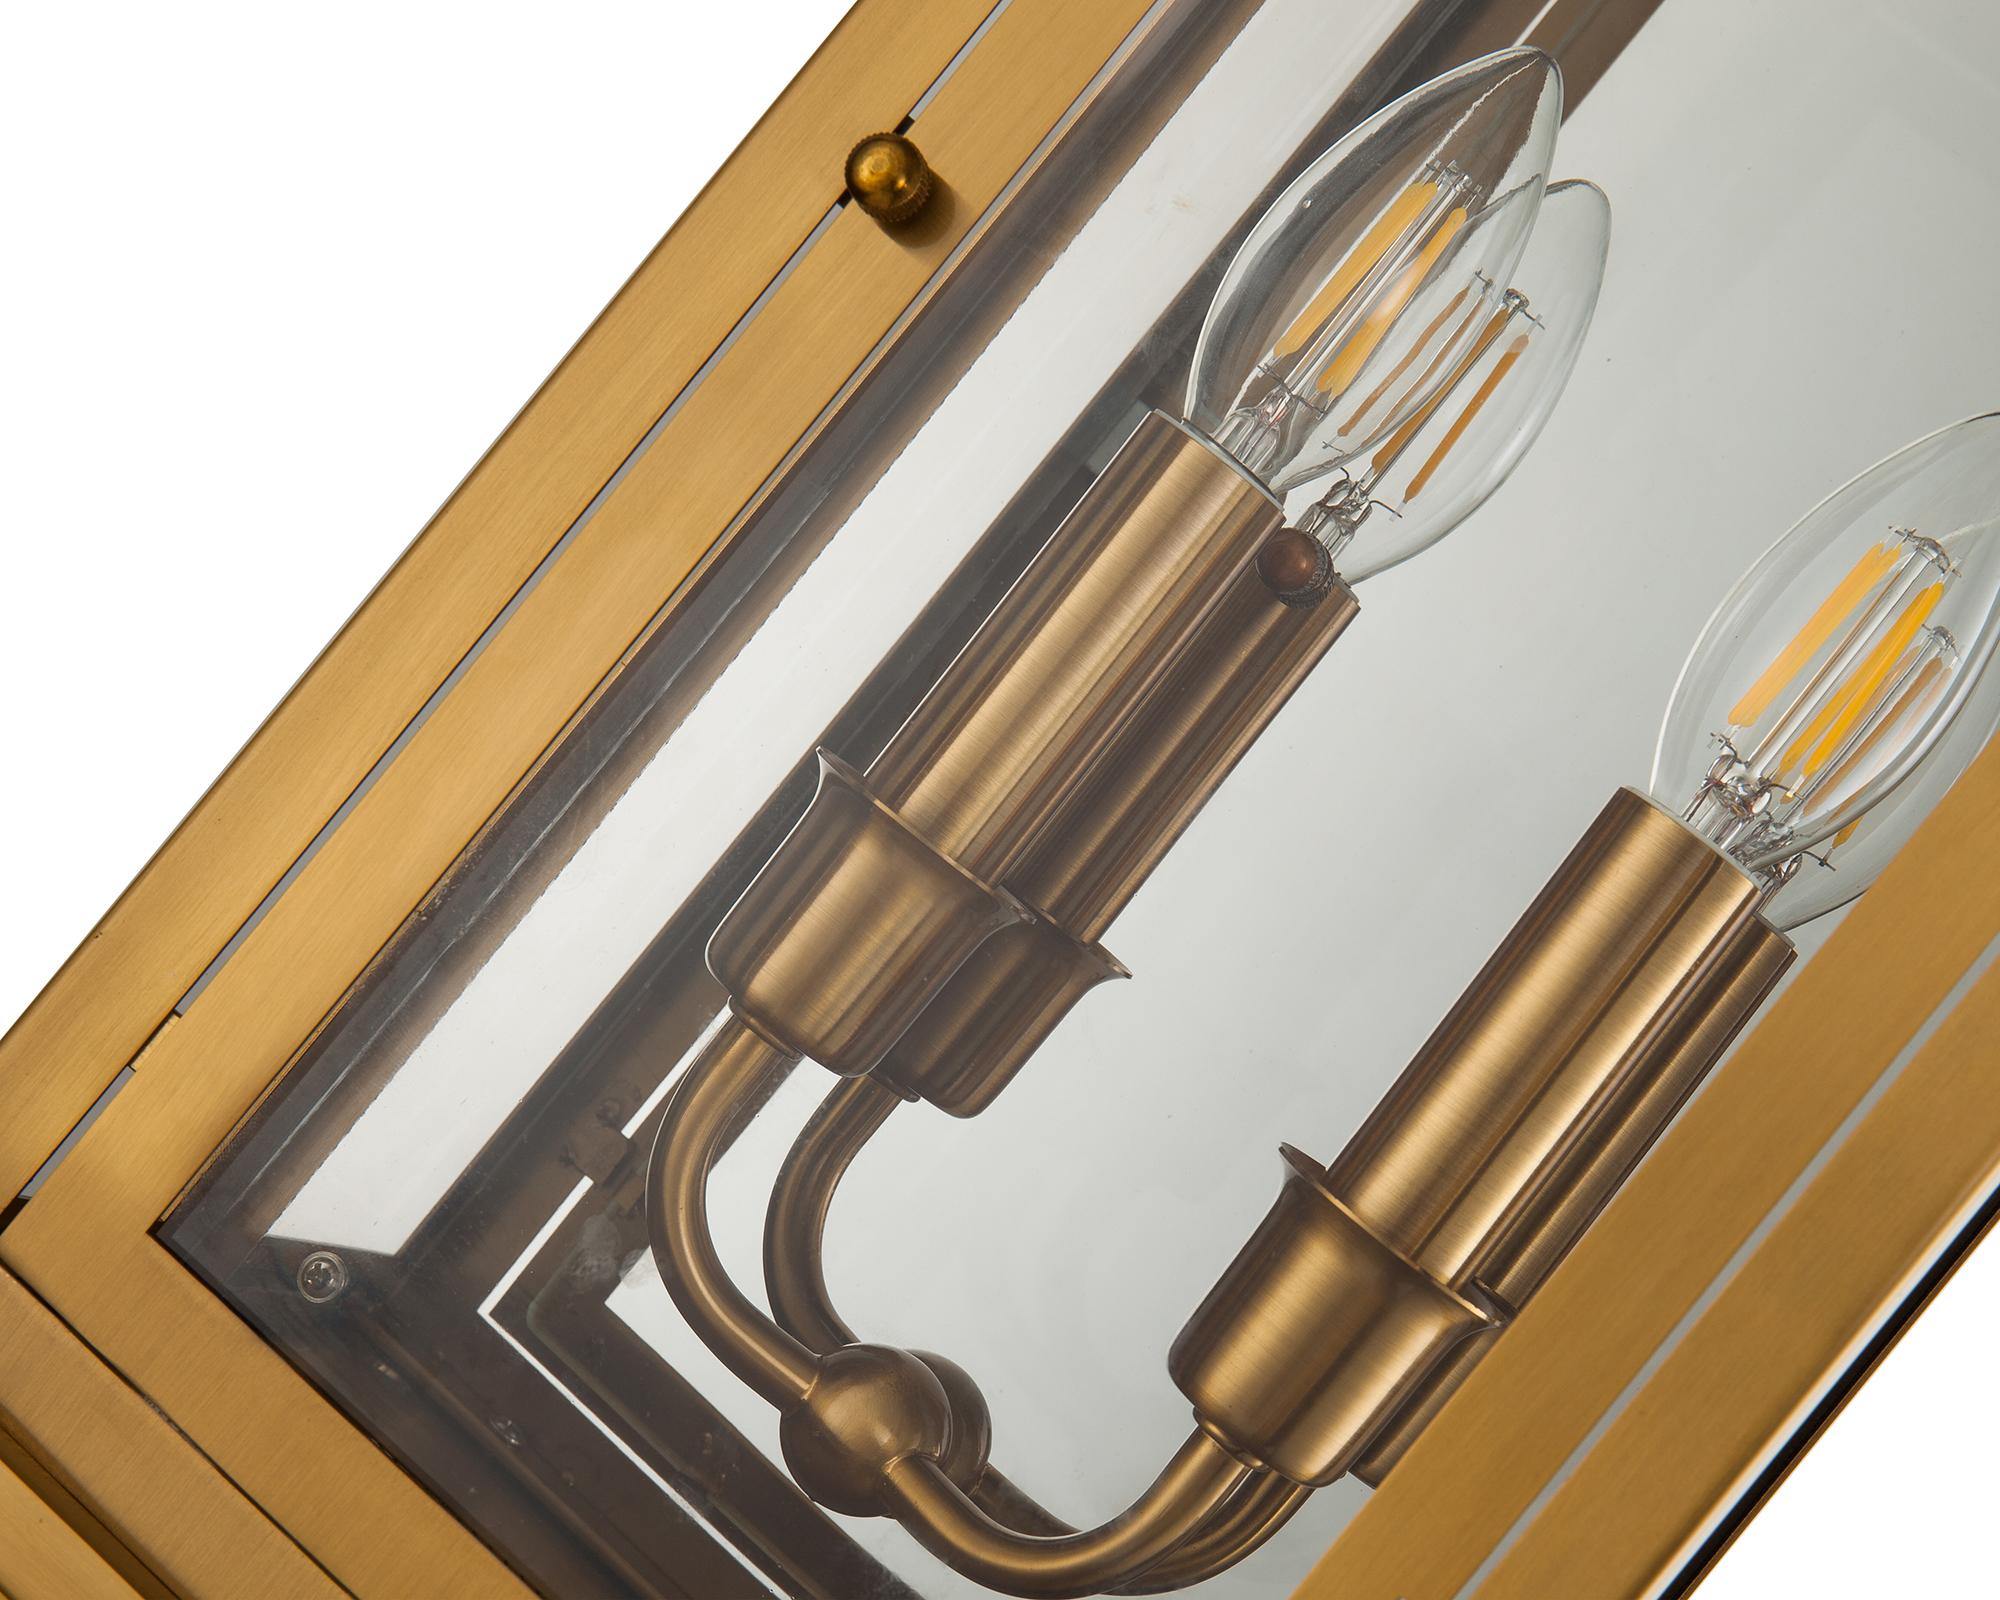 Liang & Eimil KN-LGT-0029 MAXIM WALL LIGHT (1)